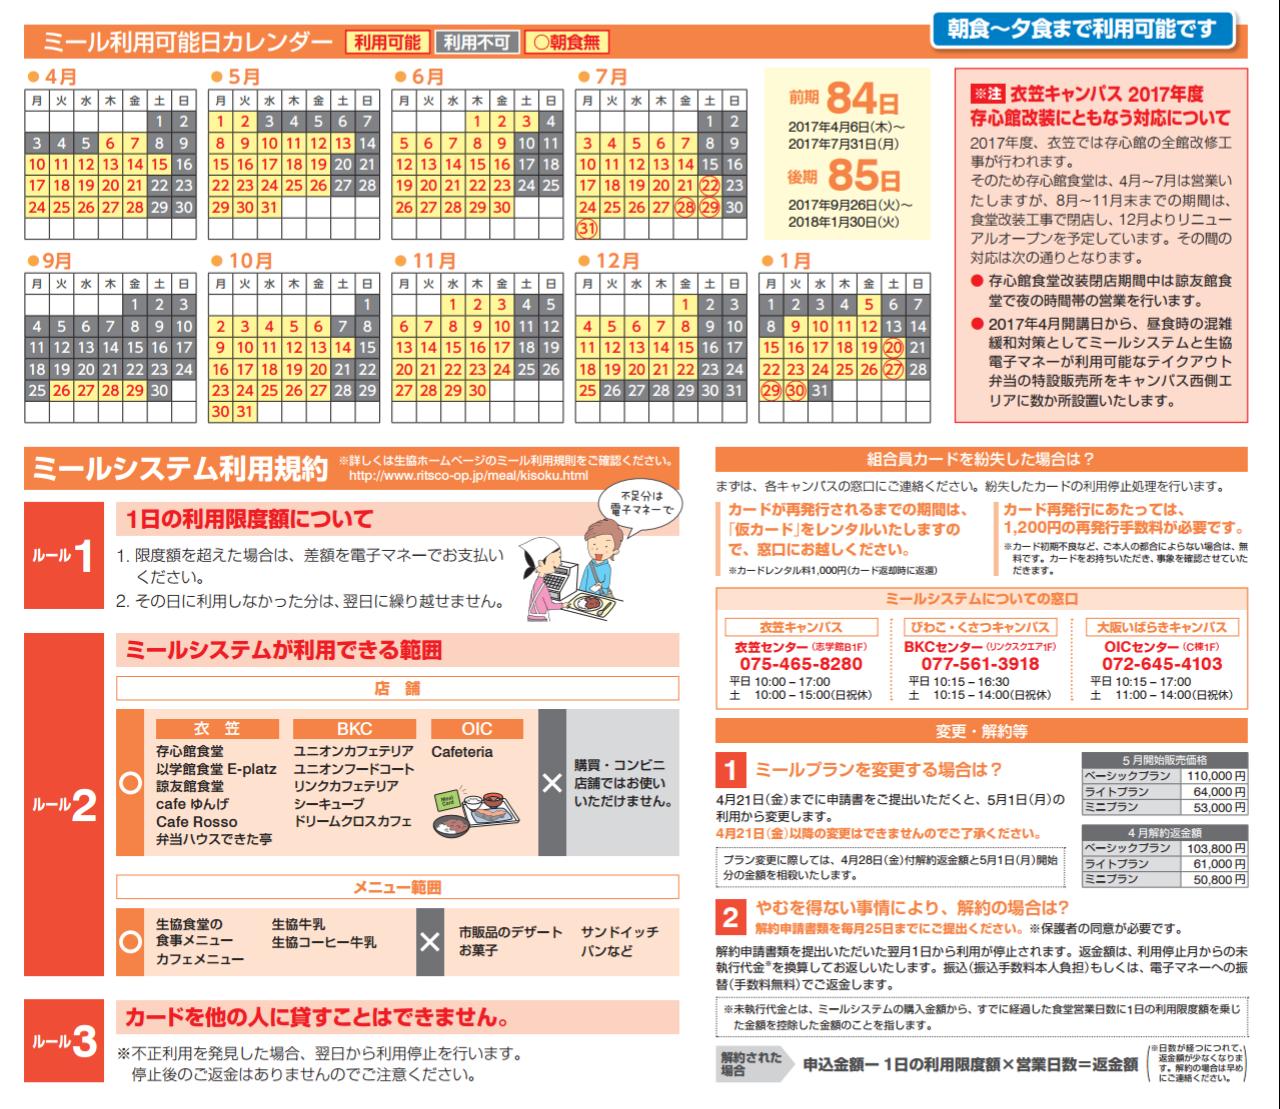 http://www.ritsco-op.jp/pickup/Screenmemo_2017-02-17-15-50-12.png